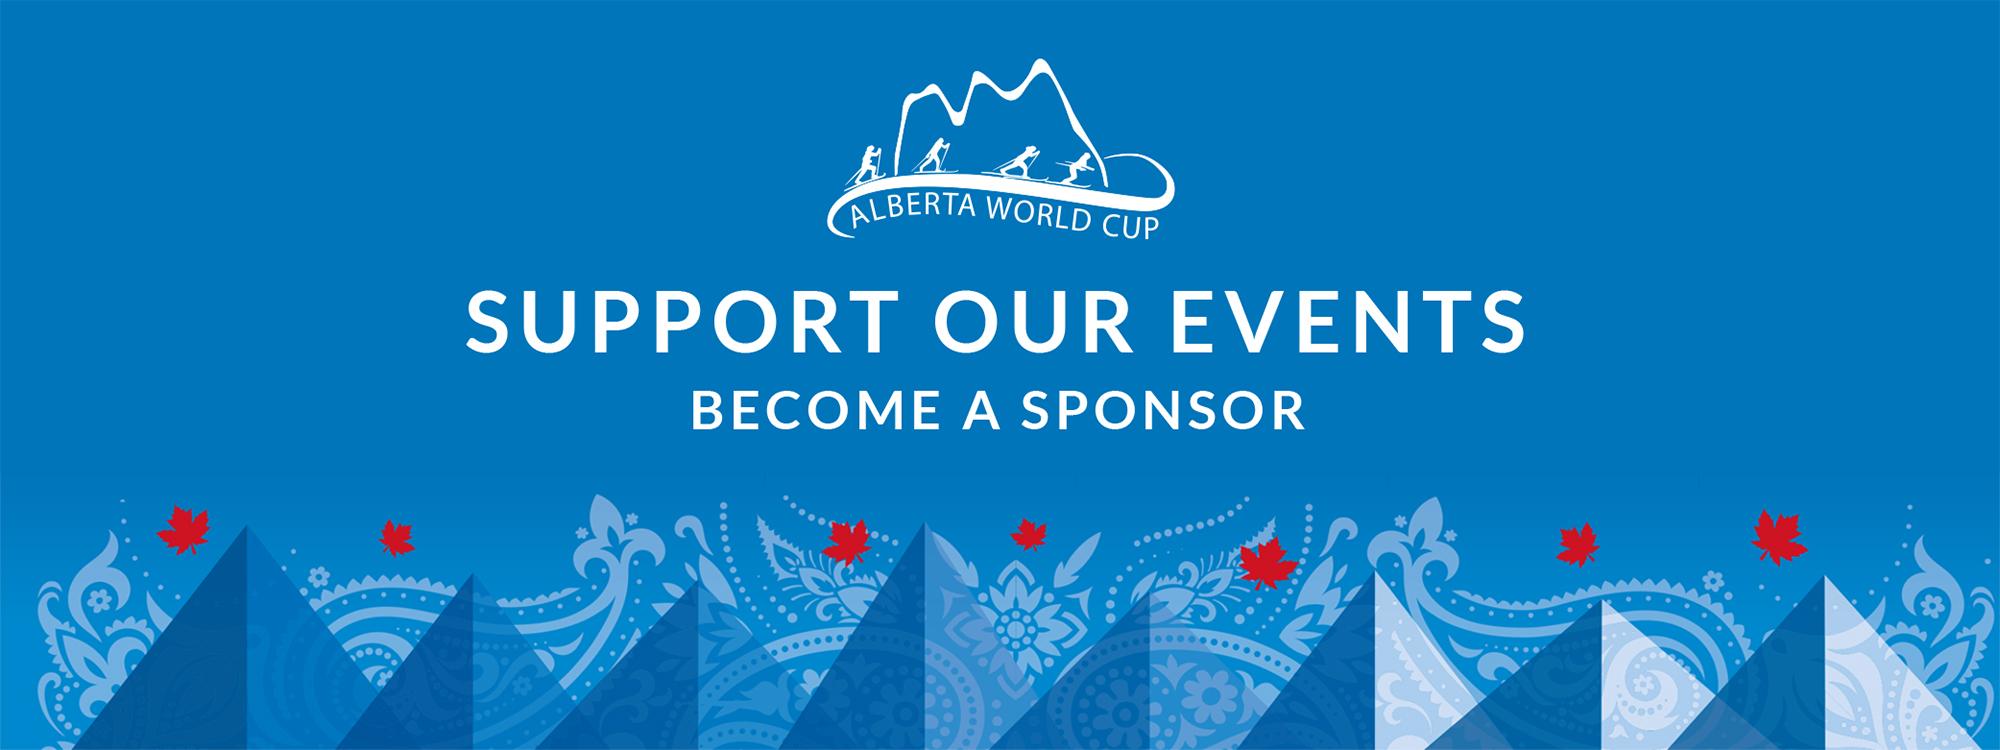 Canmore Alberta Canada Community Sponsorship